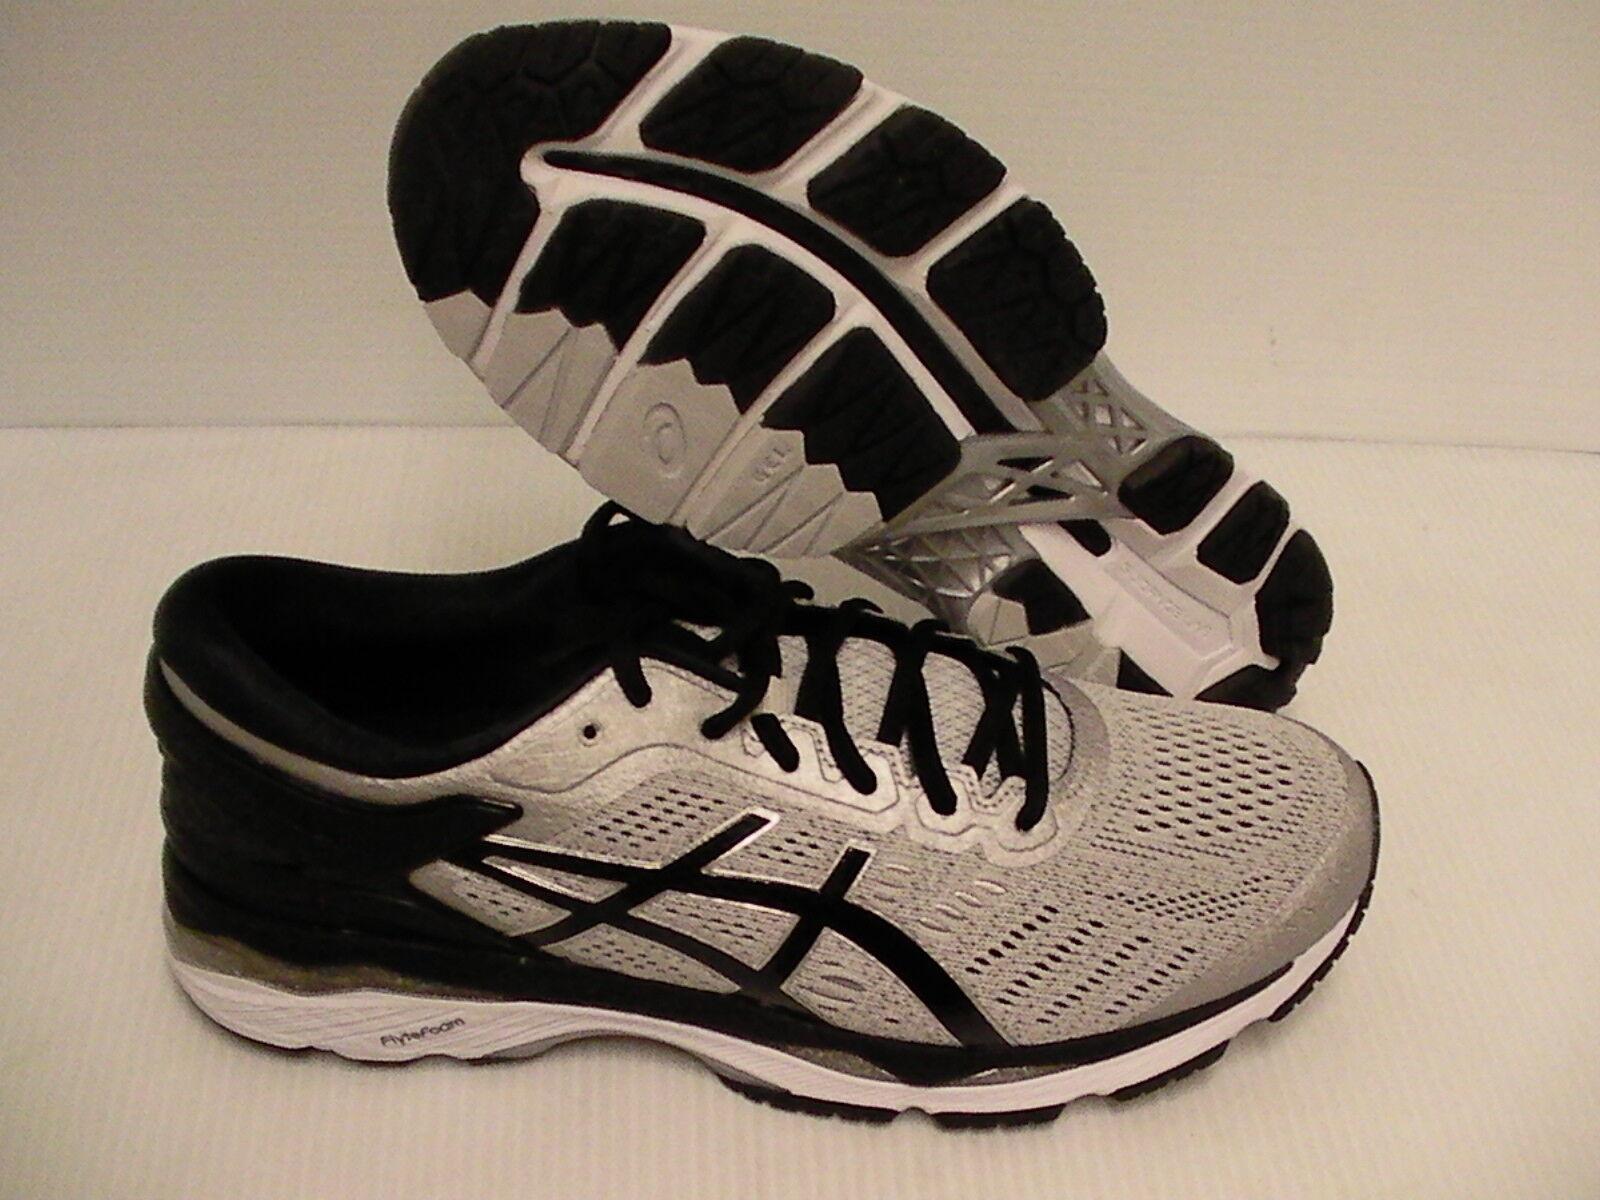 Asics men's gel kayano 24 running shoes silver black mid grey size 10.5